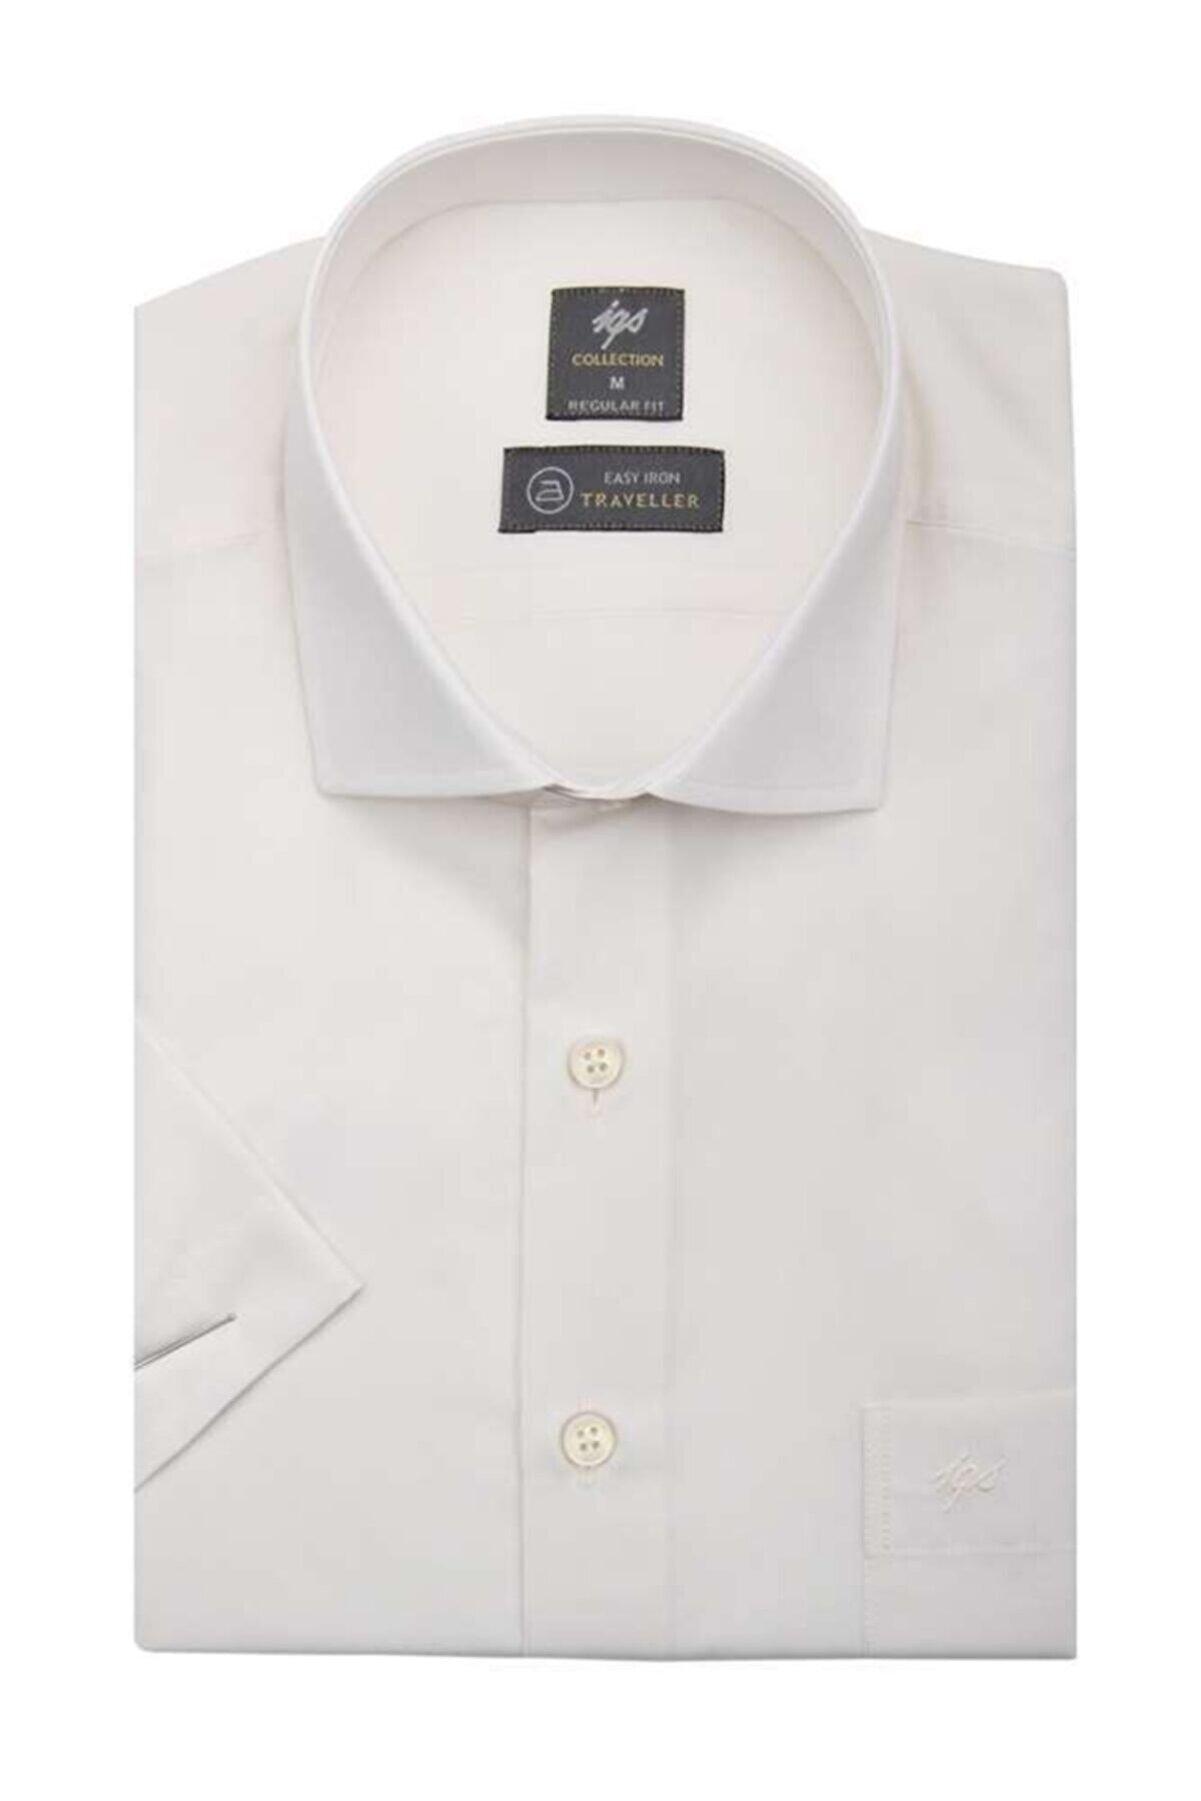 İgs Erkek Ekru Regularfıt / Rahat Kalıp Std Gömlek Kısa Kol